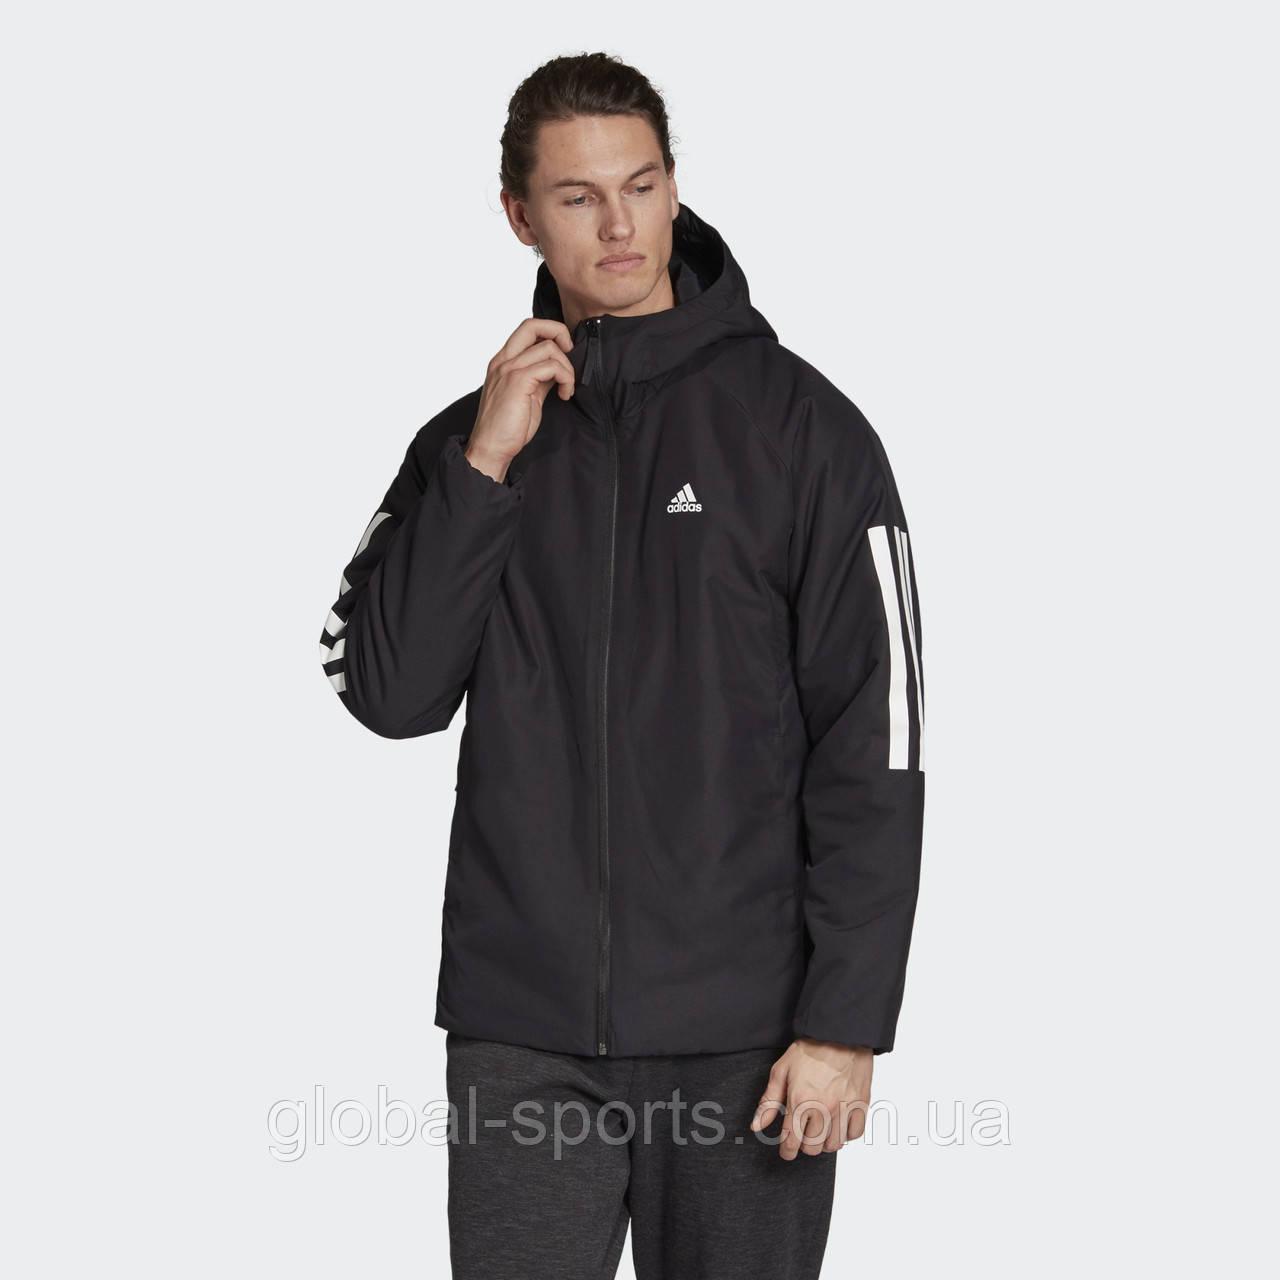 Мужская куртка Adidas Back-to-Sports 3-Stripes(Артикул:DZ1403)